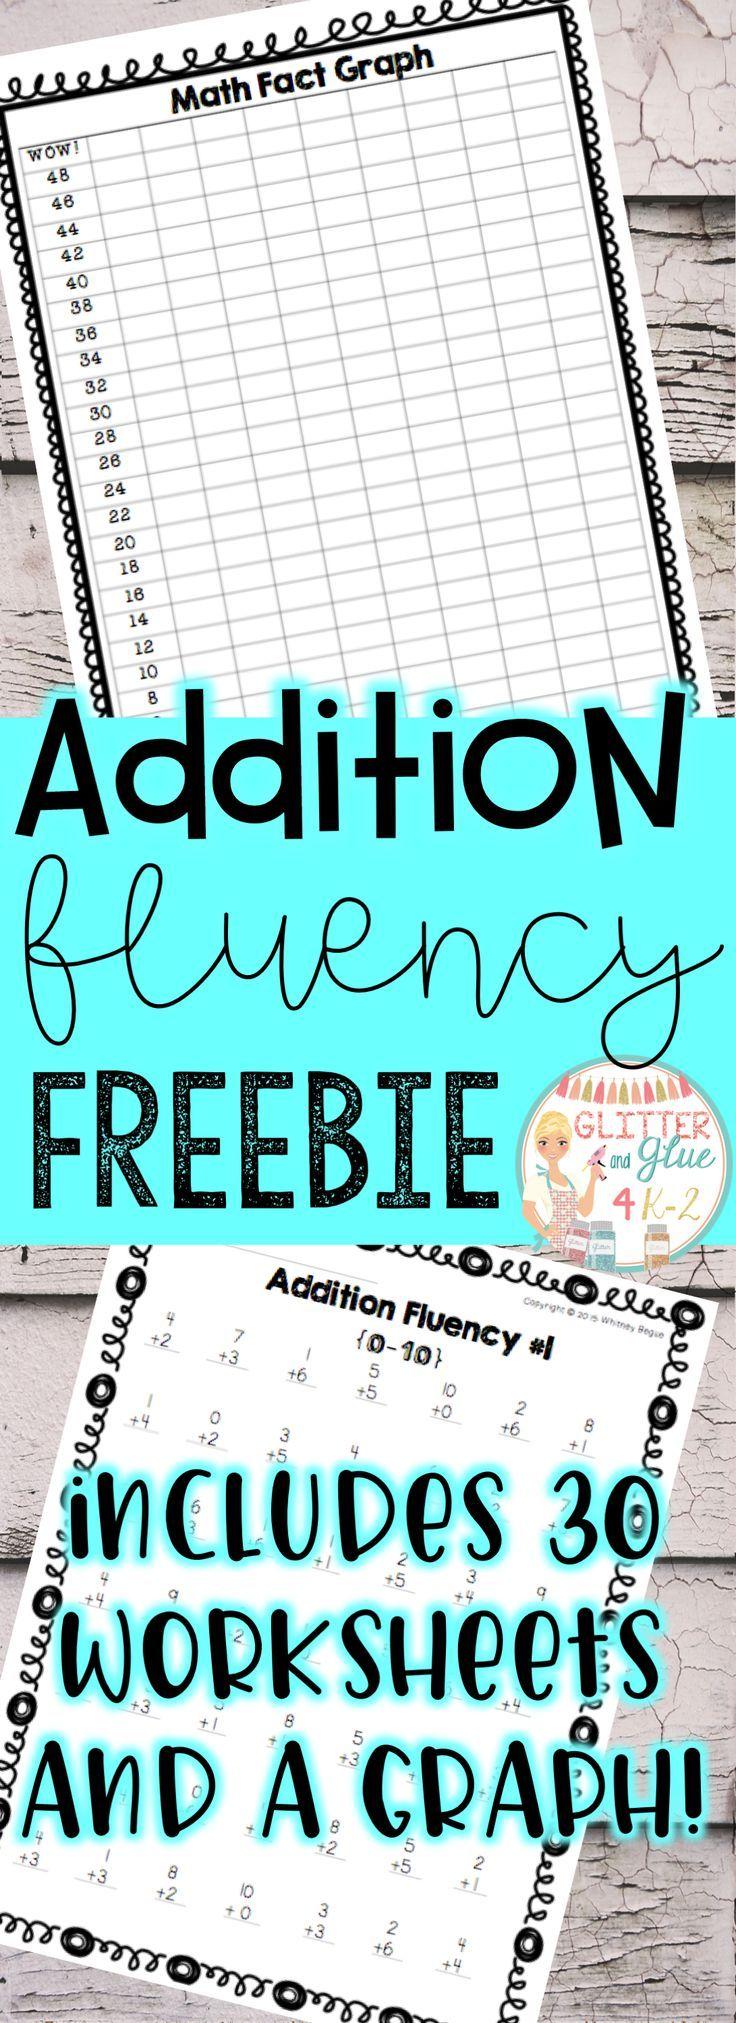 Addition Fluency Freebie: Sums to 10 | 2nd grade math | Pinterest ...